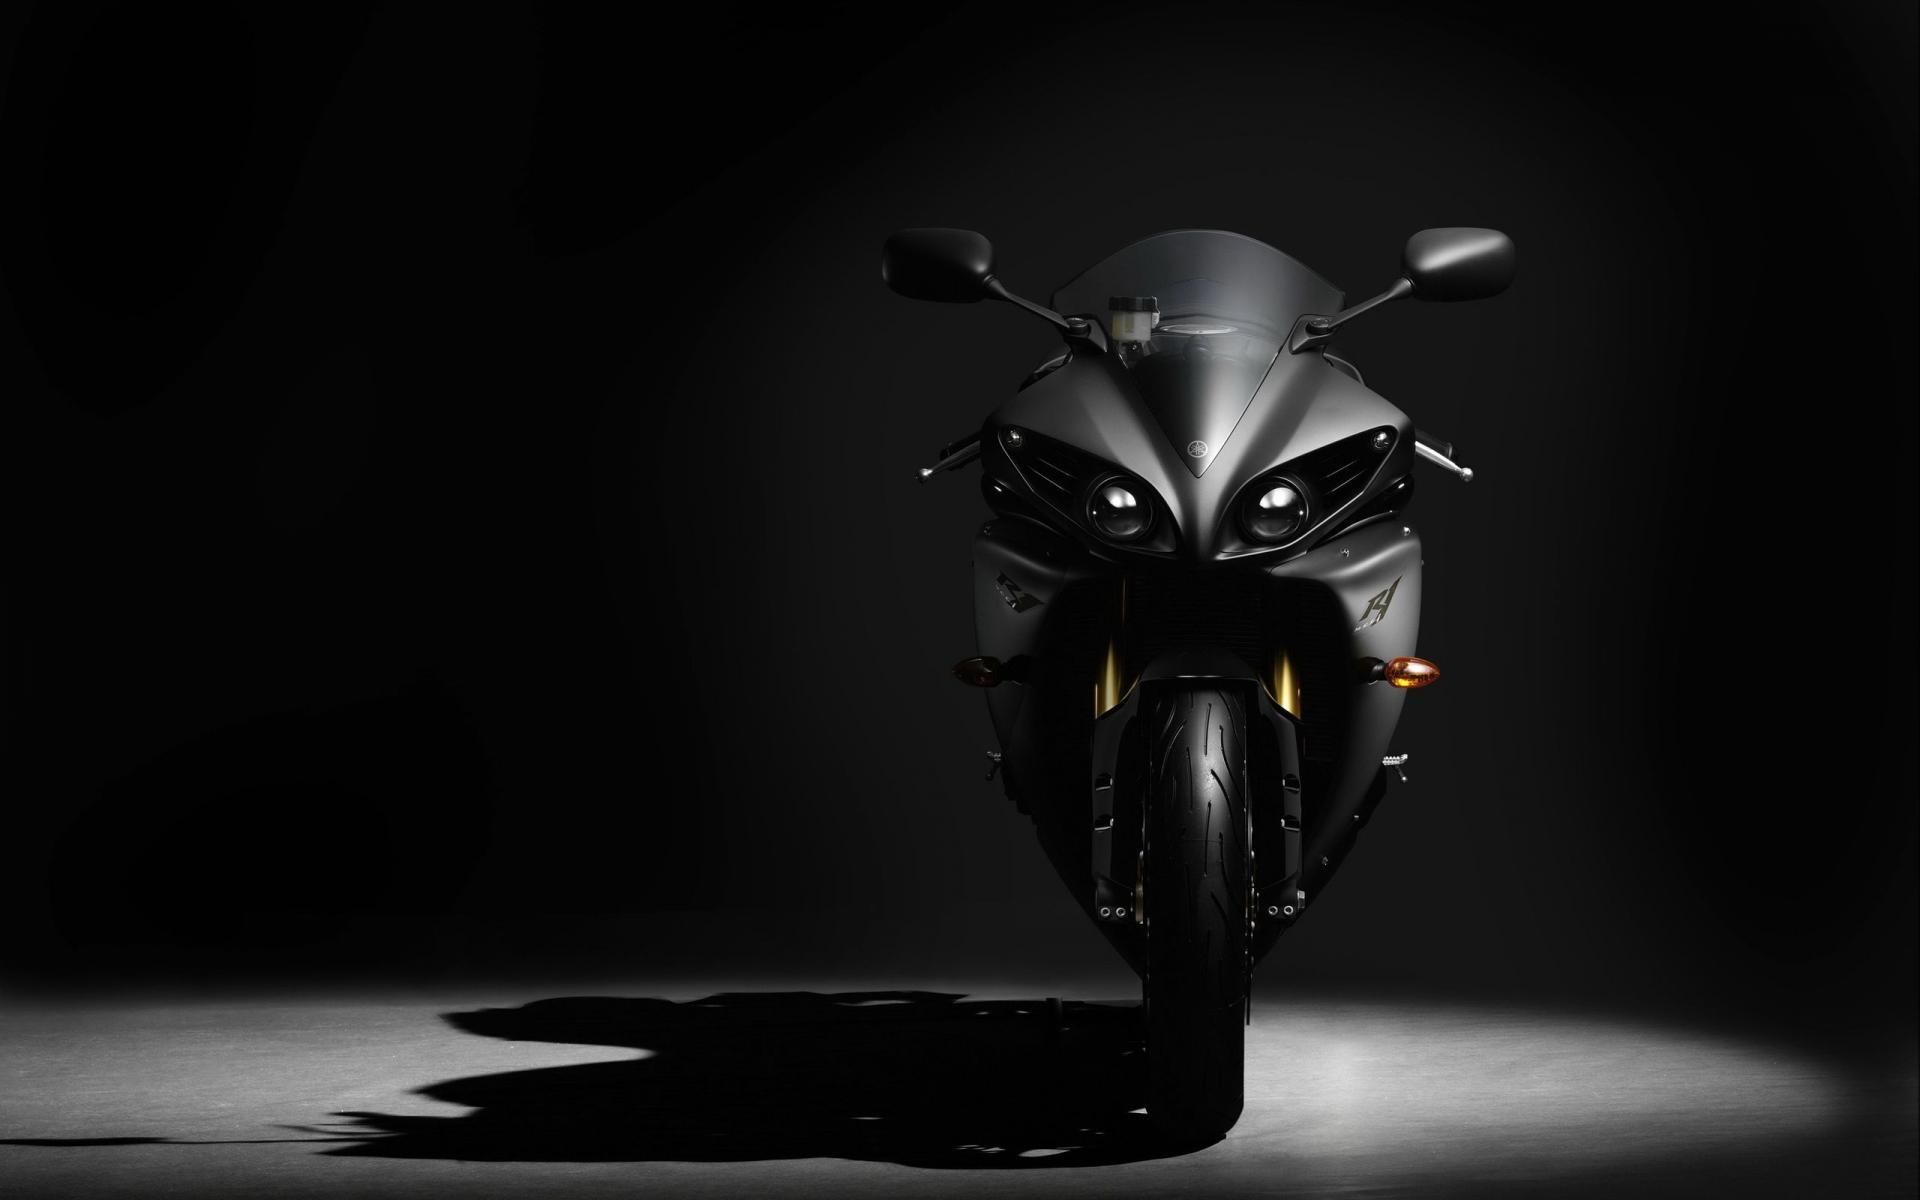 Wallpaper Moto Yamaha R1